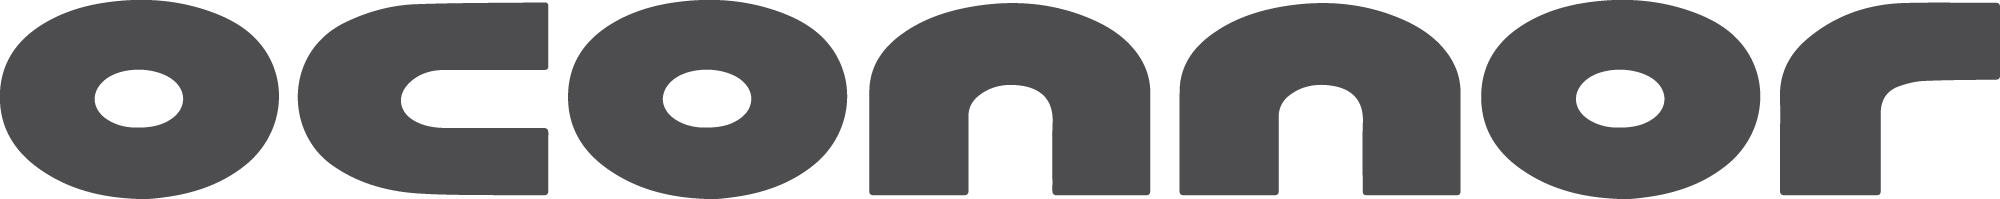 OConnor logo